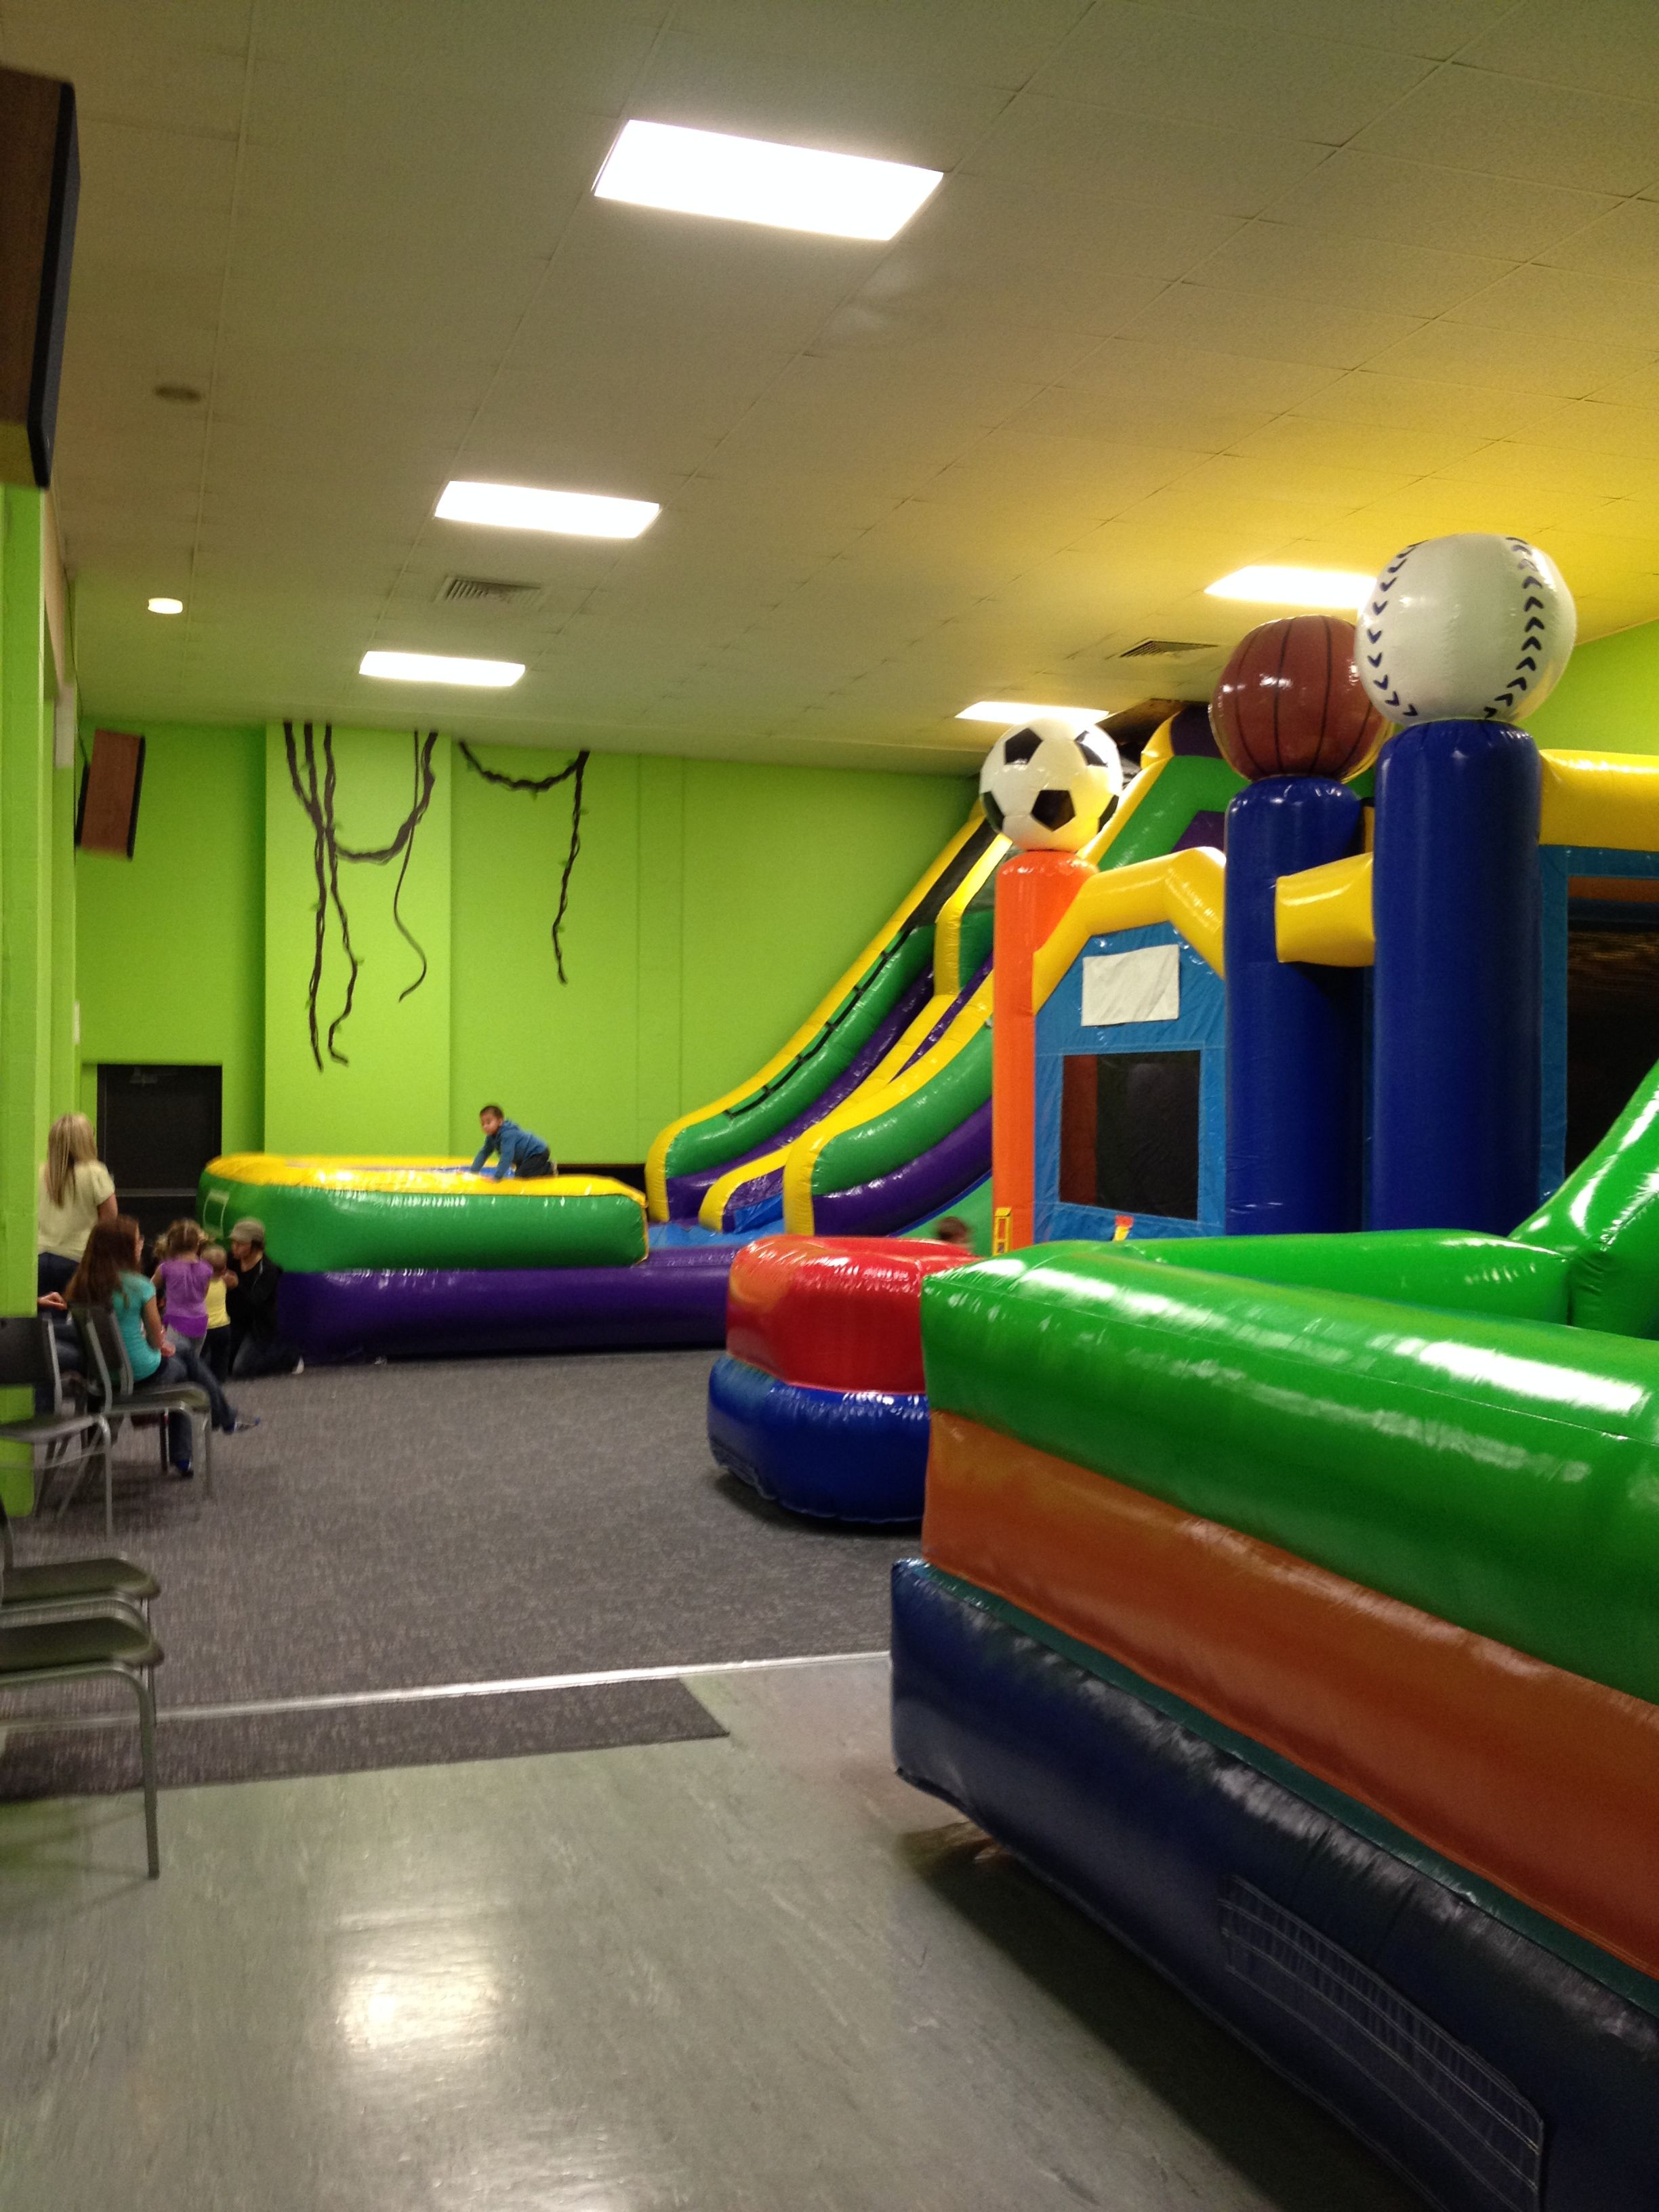 Jump N Party Spokane S Leading Birthday Party Place Birthday Party Places Party Places Kids Party